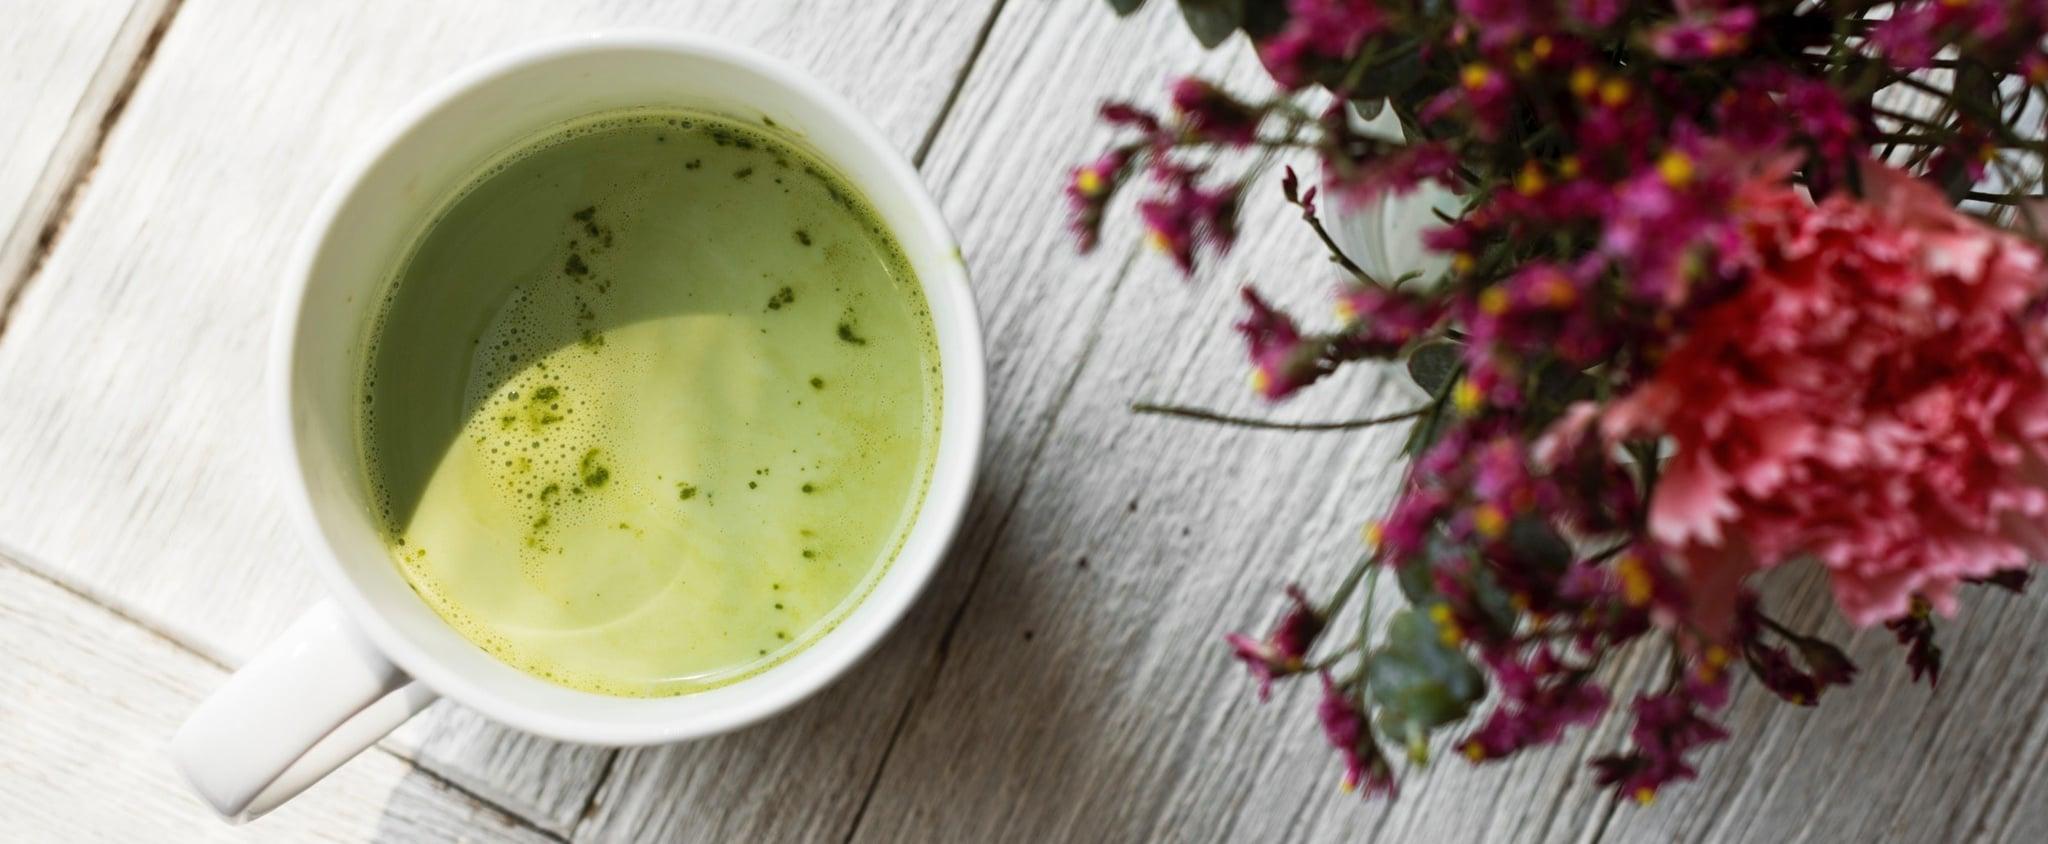 Benefits of Drinking Matcha